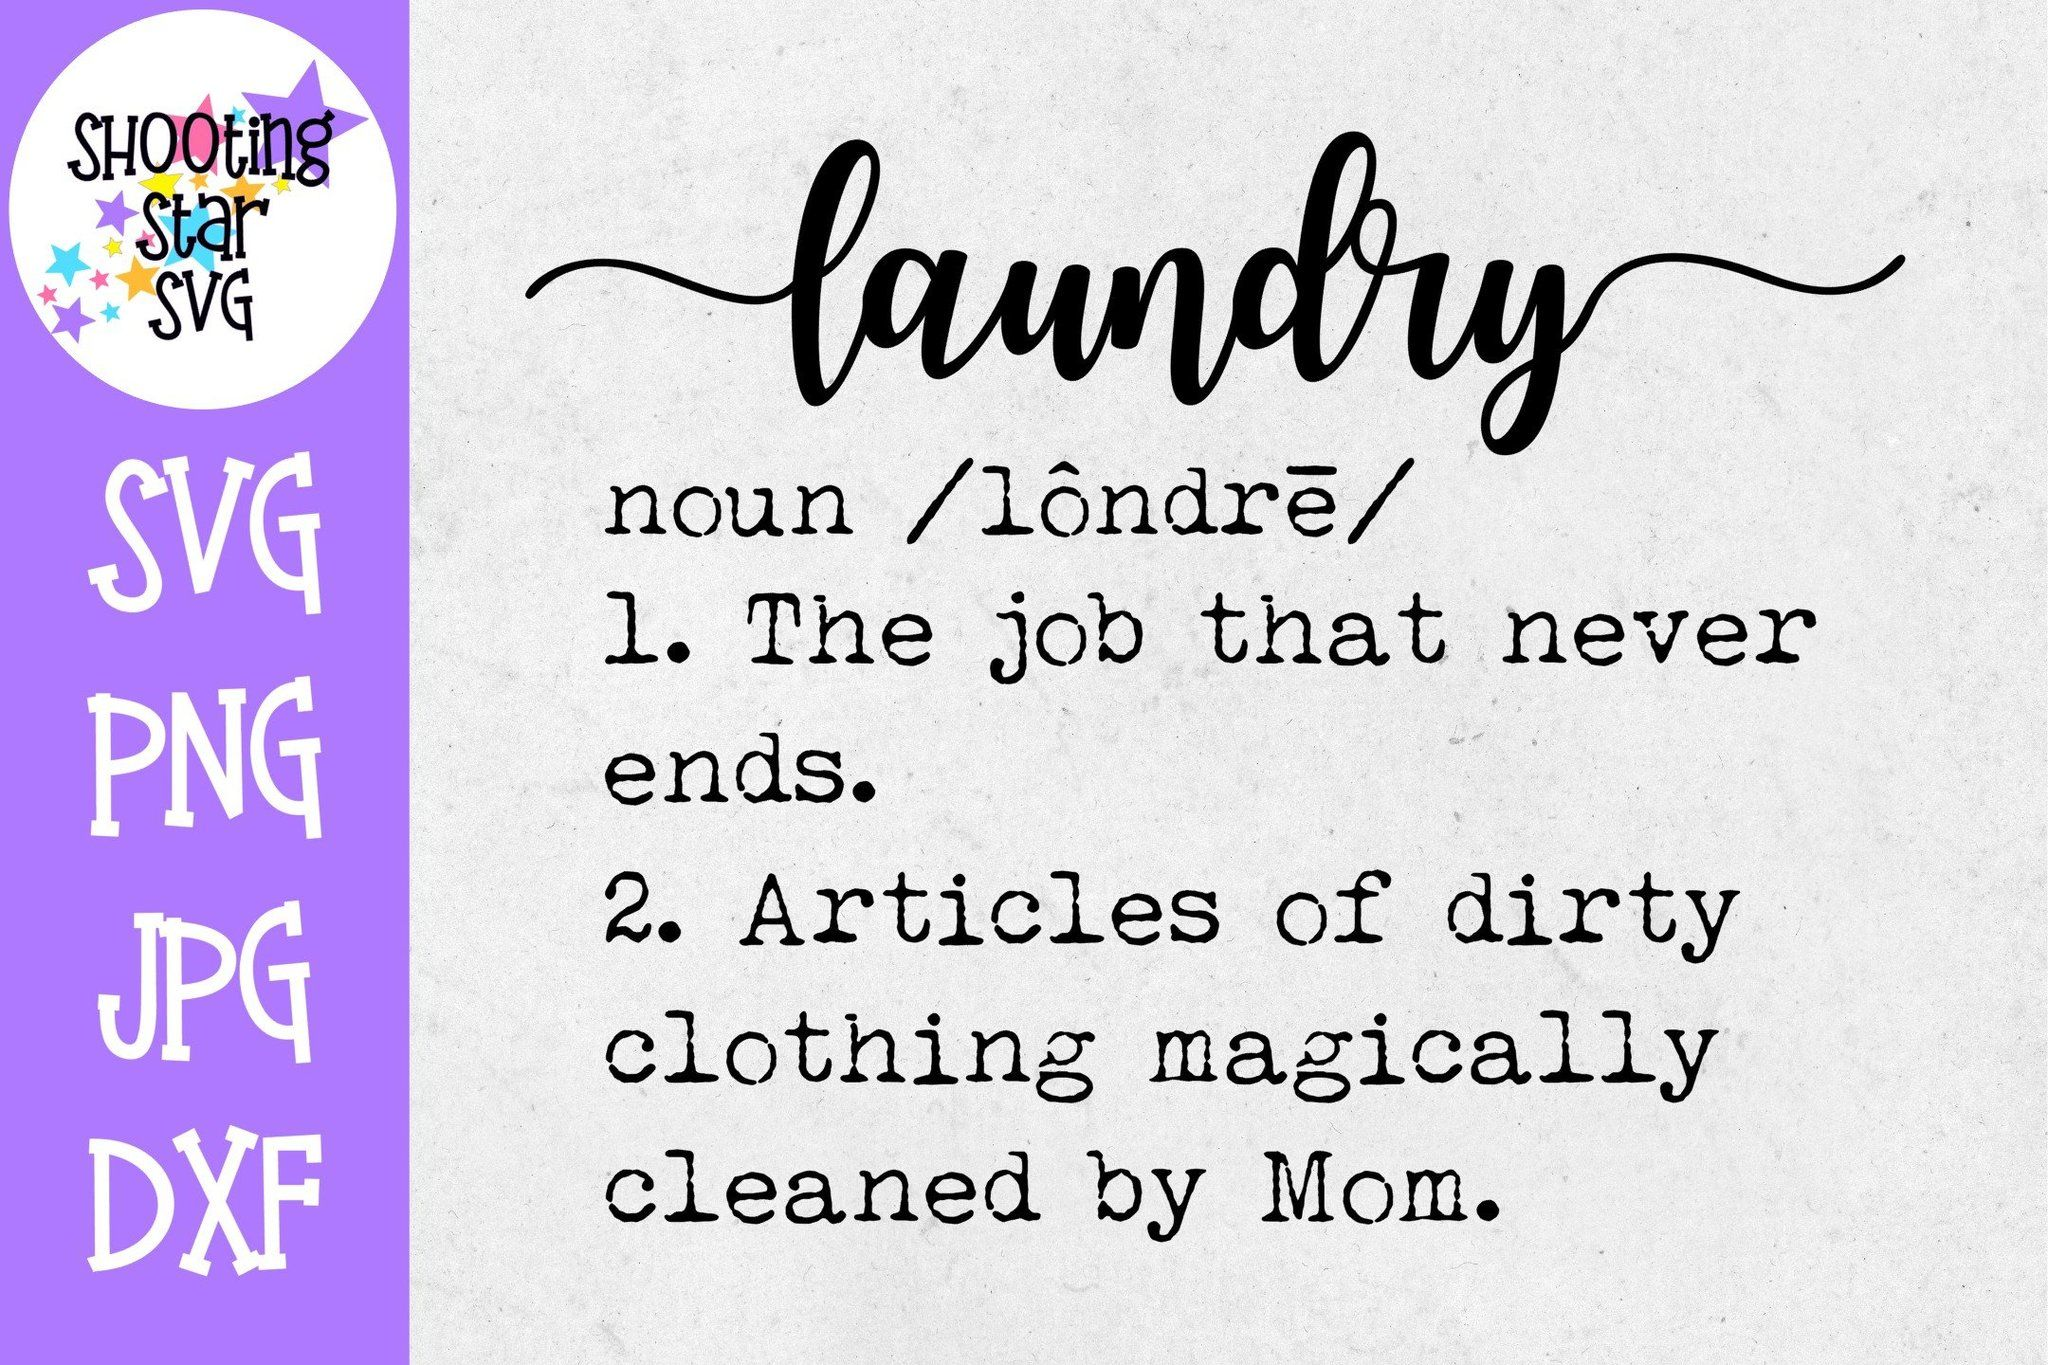 Laundry Definition SVG Funny Laundry Definition Decor